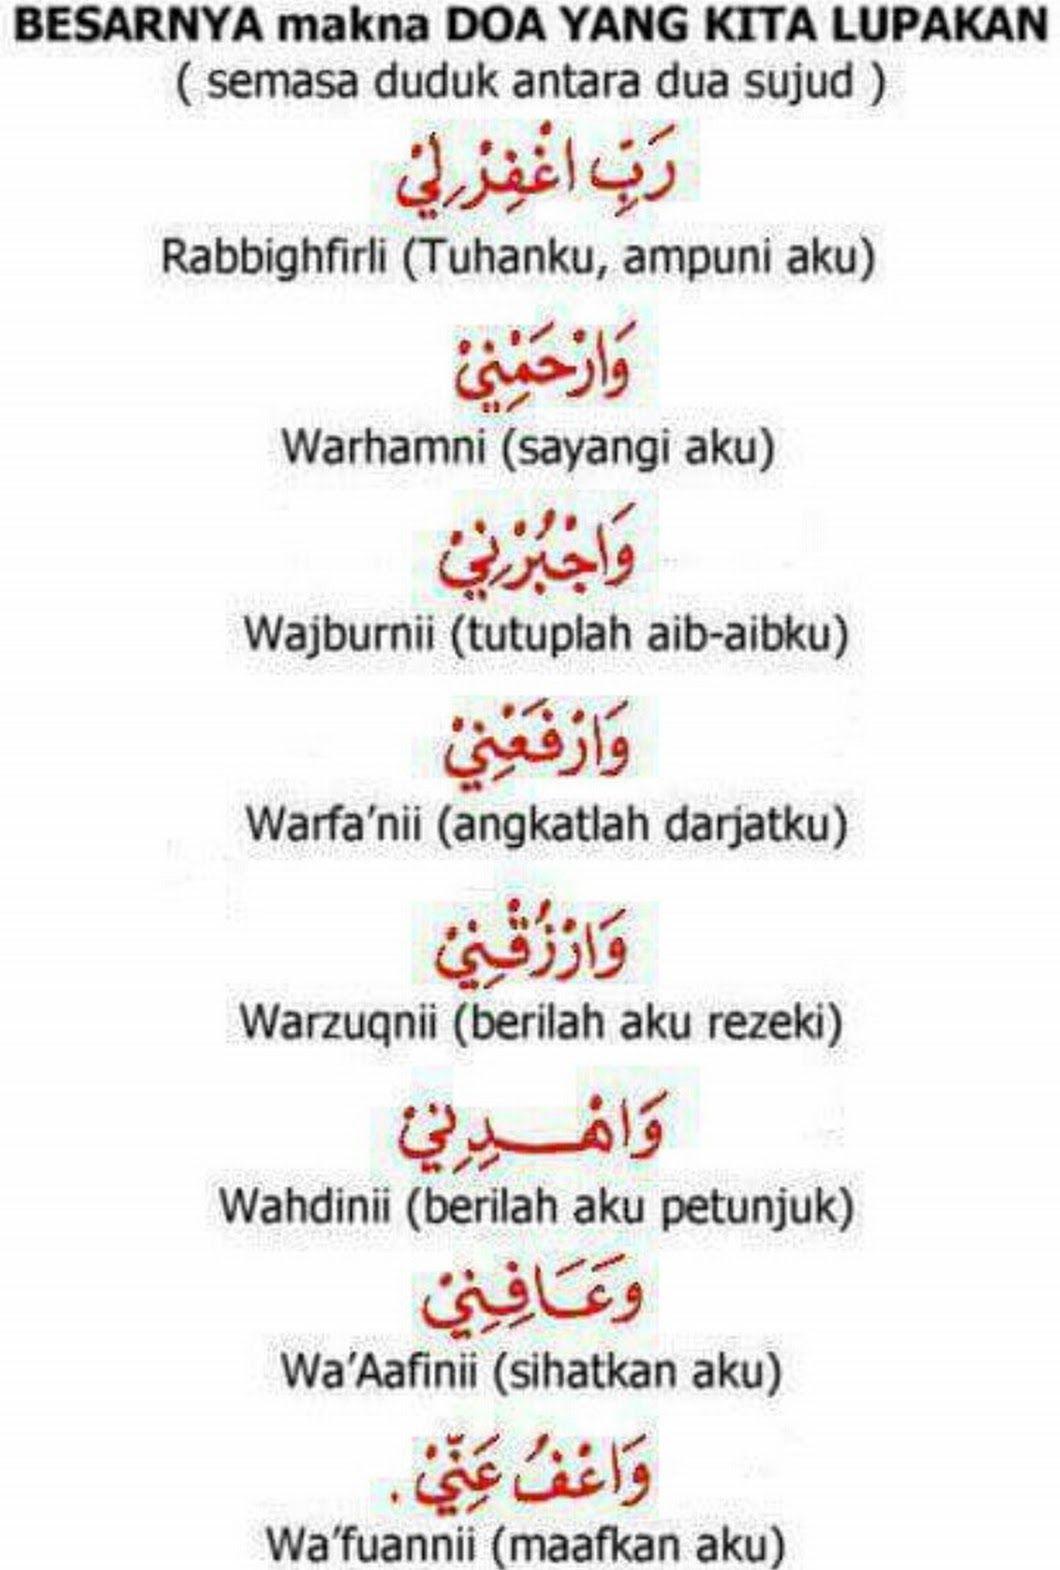 Arti Doa Diantara Dua Sujud : diantara, sujud, Kata-kata, Mutiara,, Kutipan, Quran,